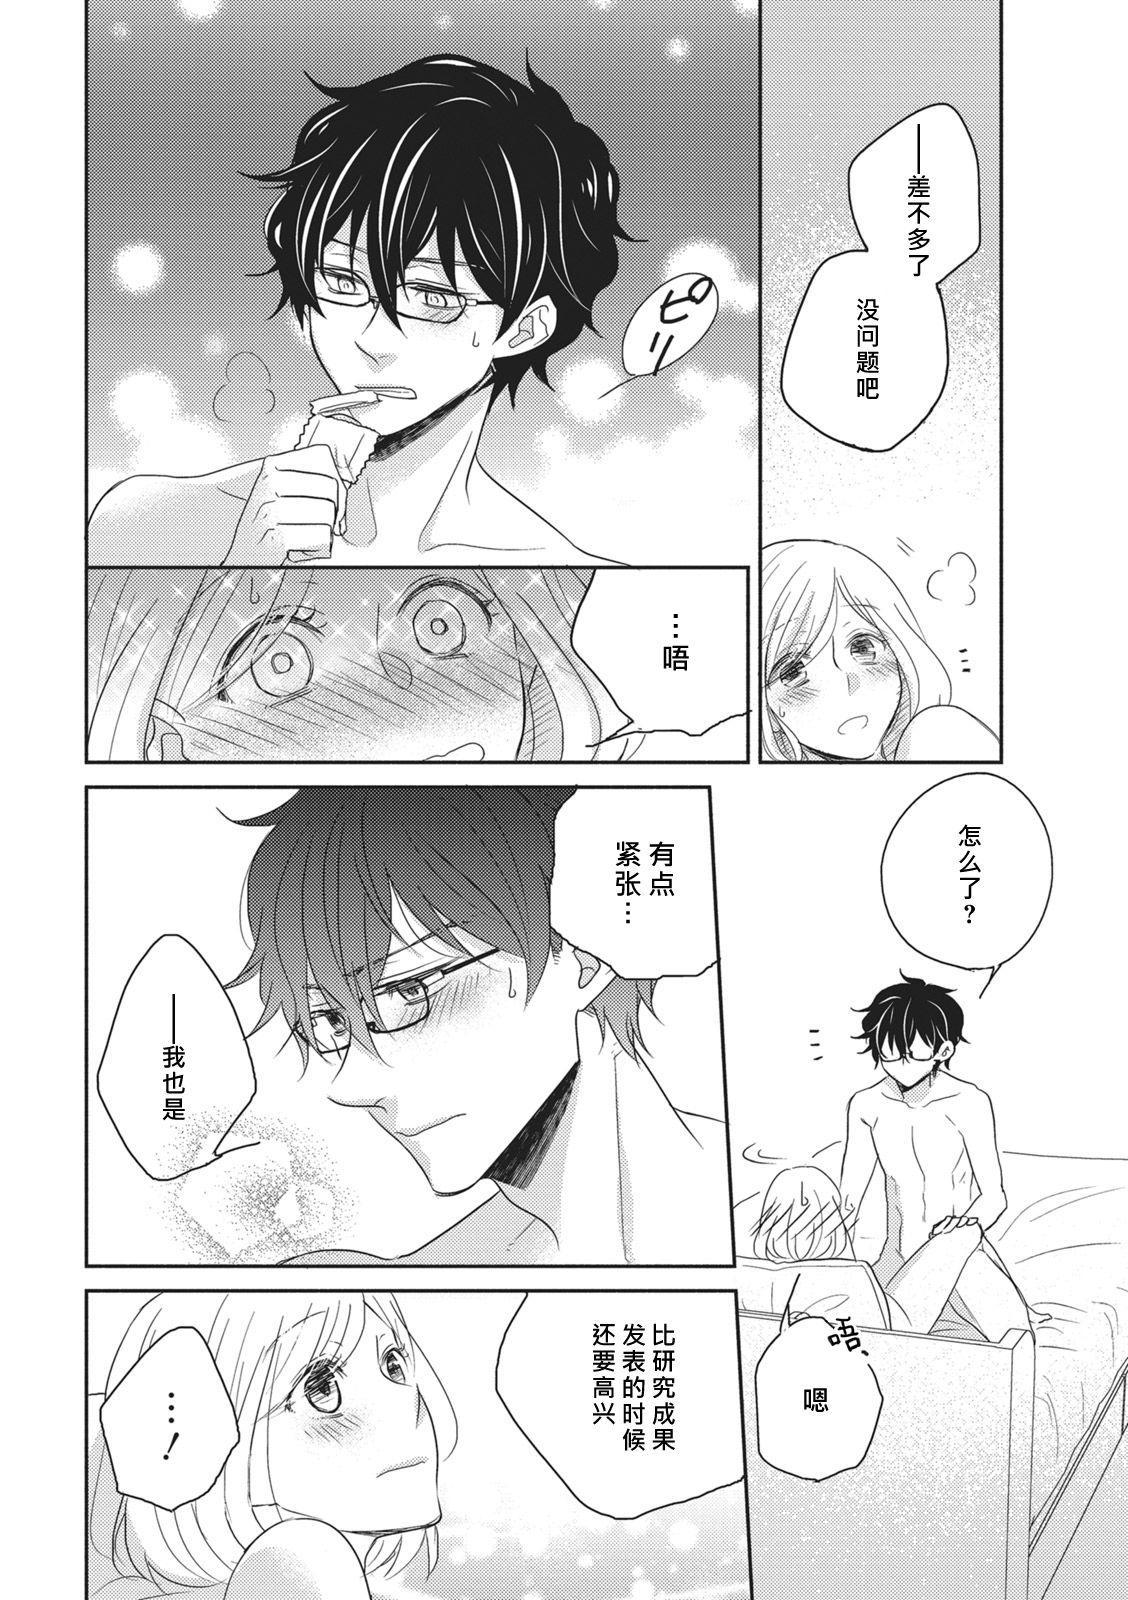 HaTsuKoi LOGIC | 初恋逻辑 27